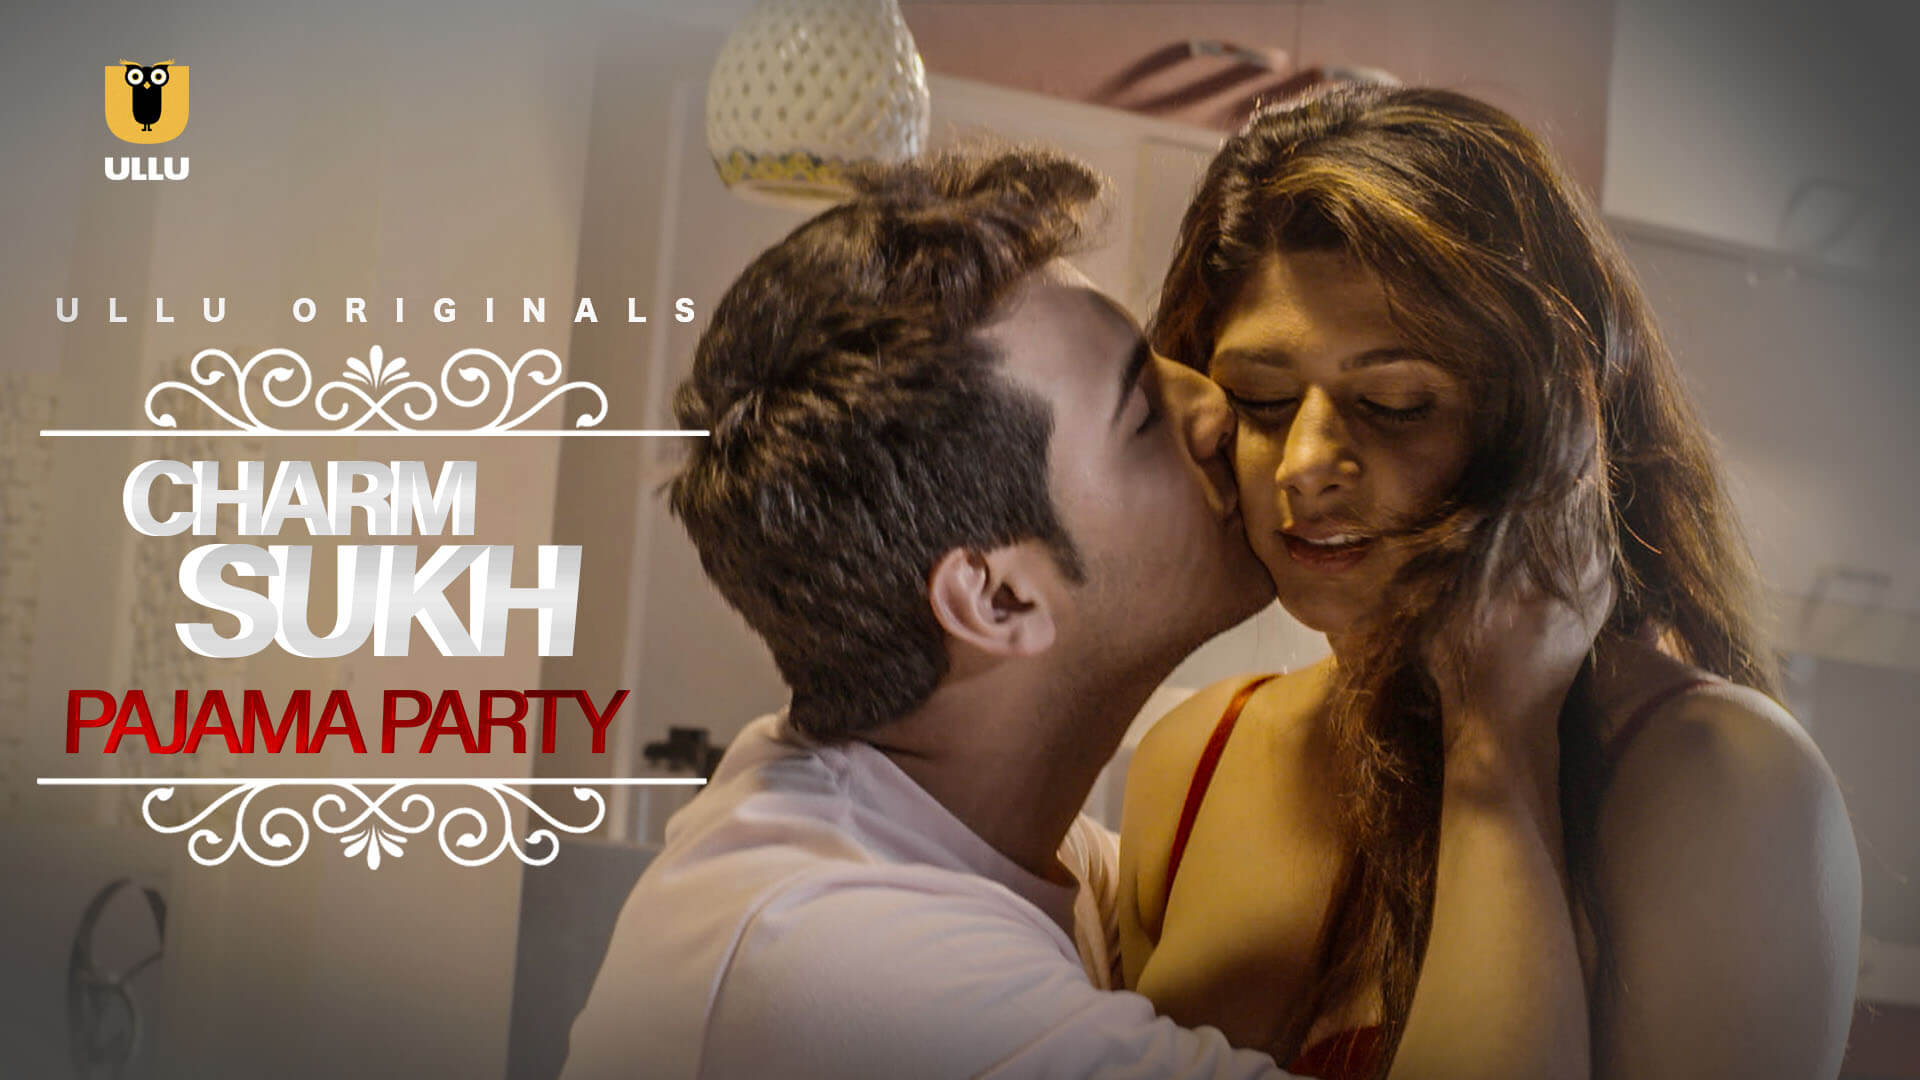 Charmsukh – Pajama Party UllU Original Hindi Hot Web Series